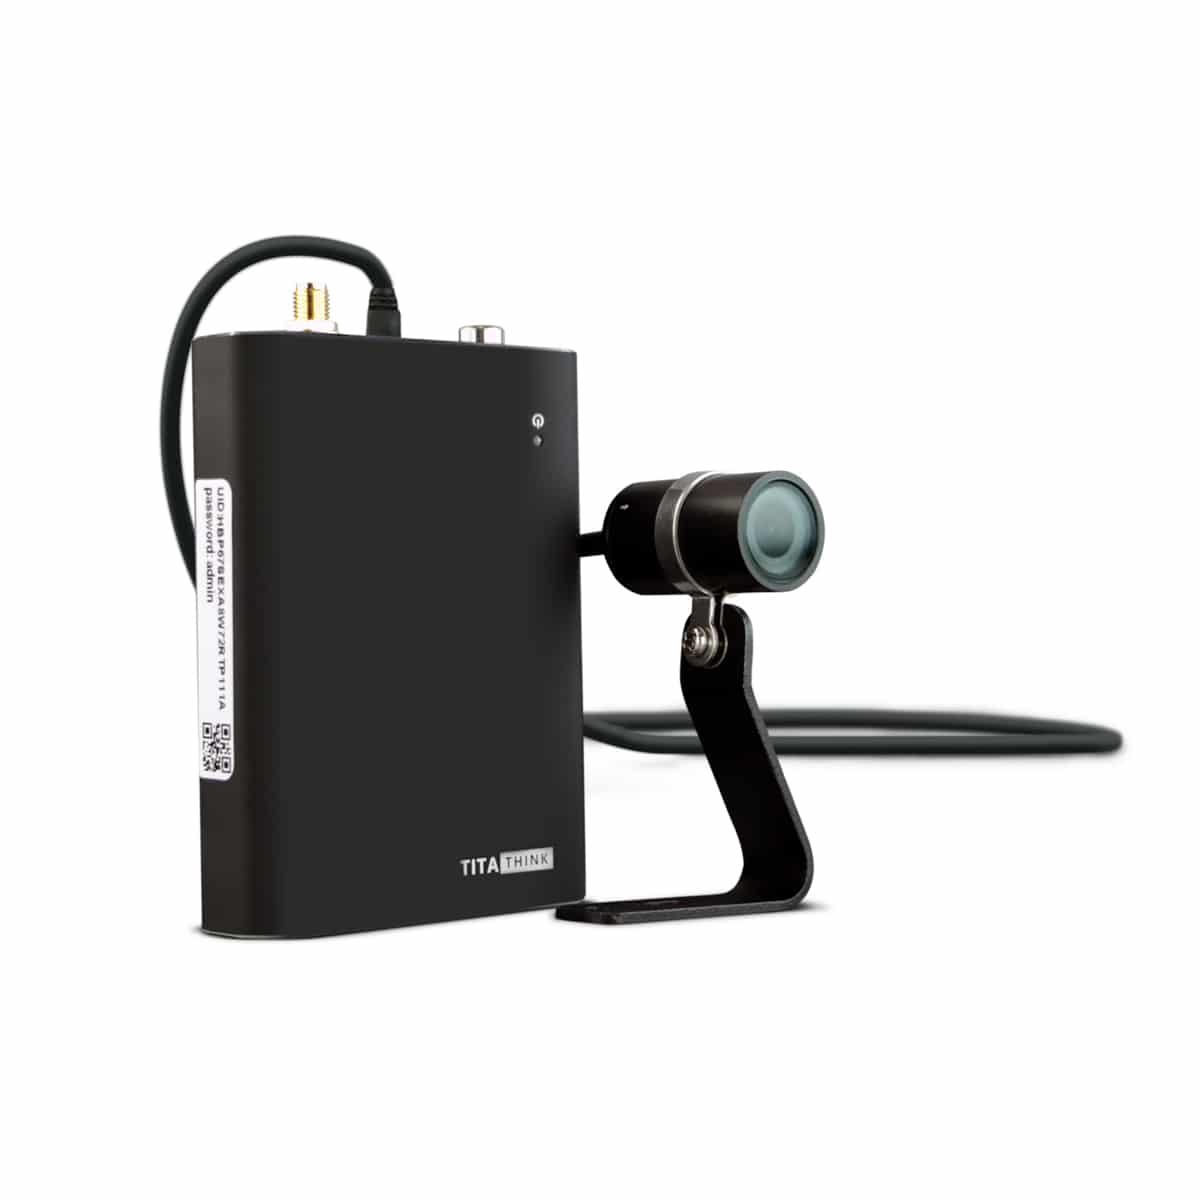 TT522PW-PRO spy hidden 720P wateproof IP Camera